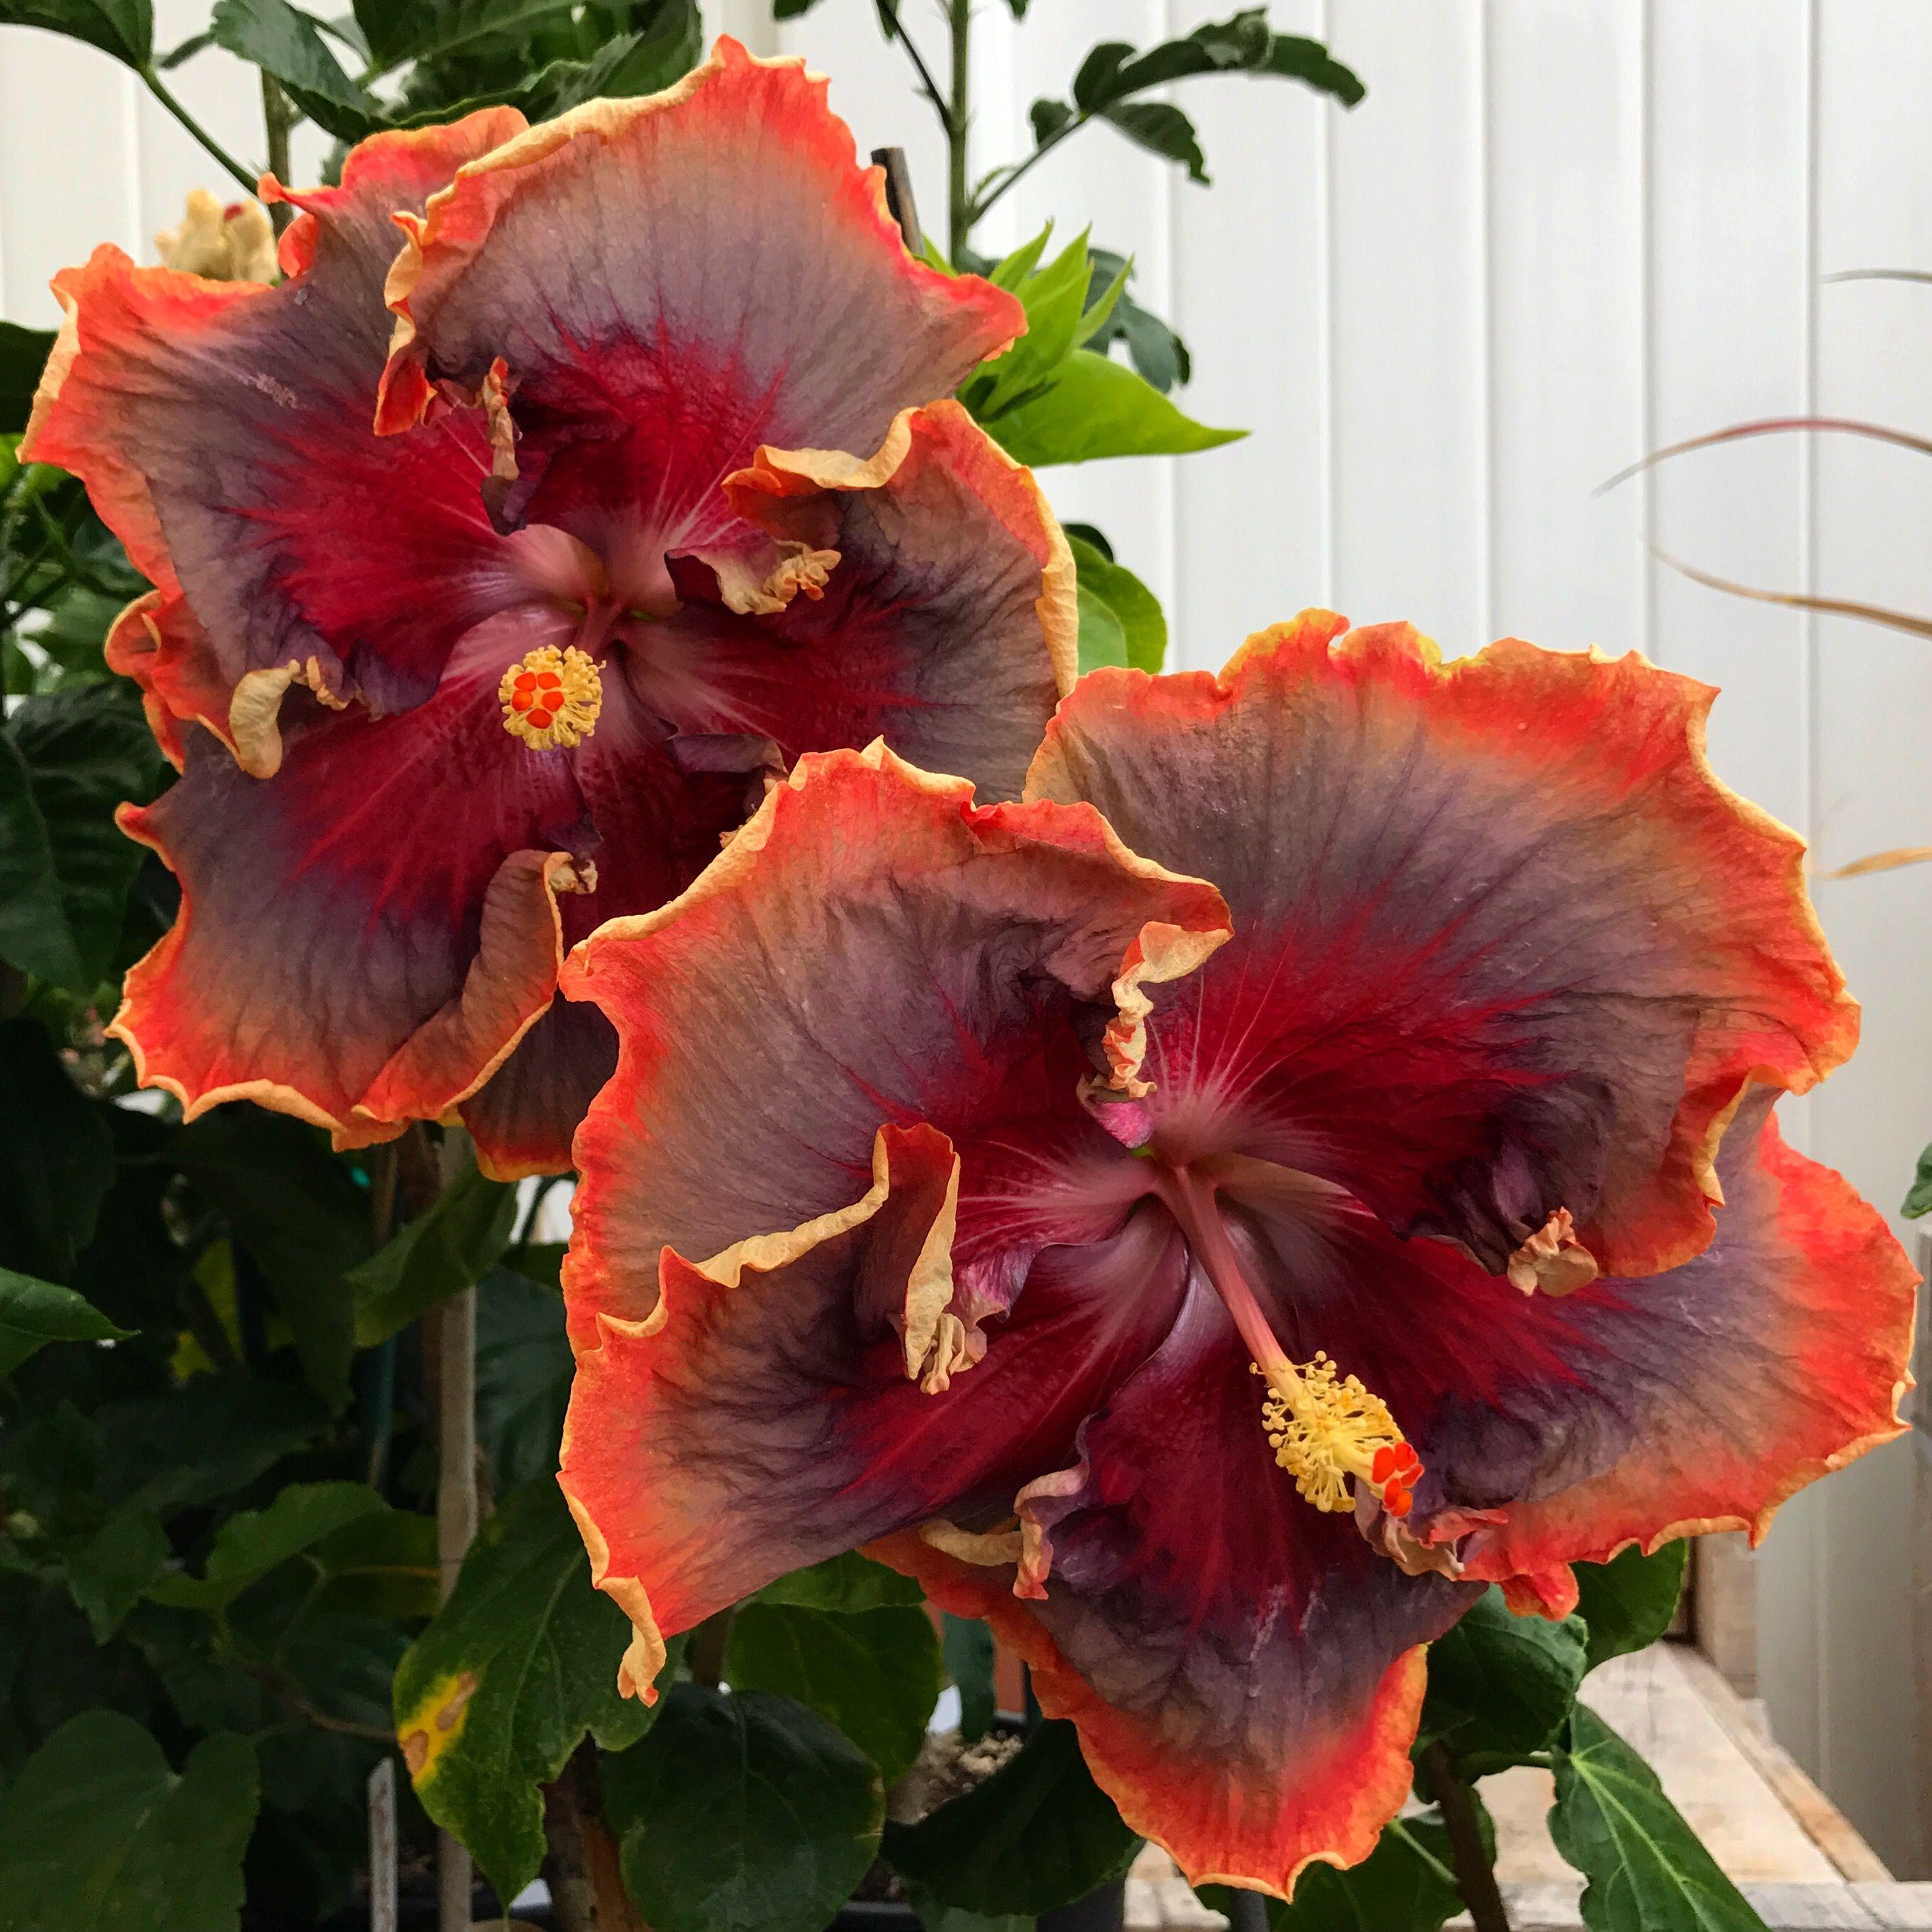 Night runner hibiscus hibiscus of hawaii pinterest hibiscus night runner hibiscus izmirmasajfo Gallery